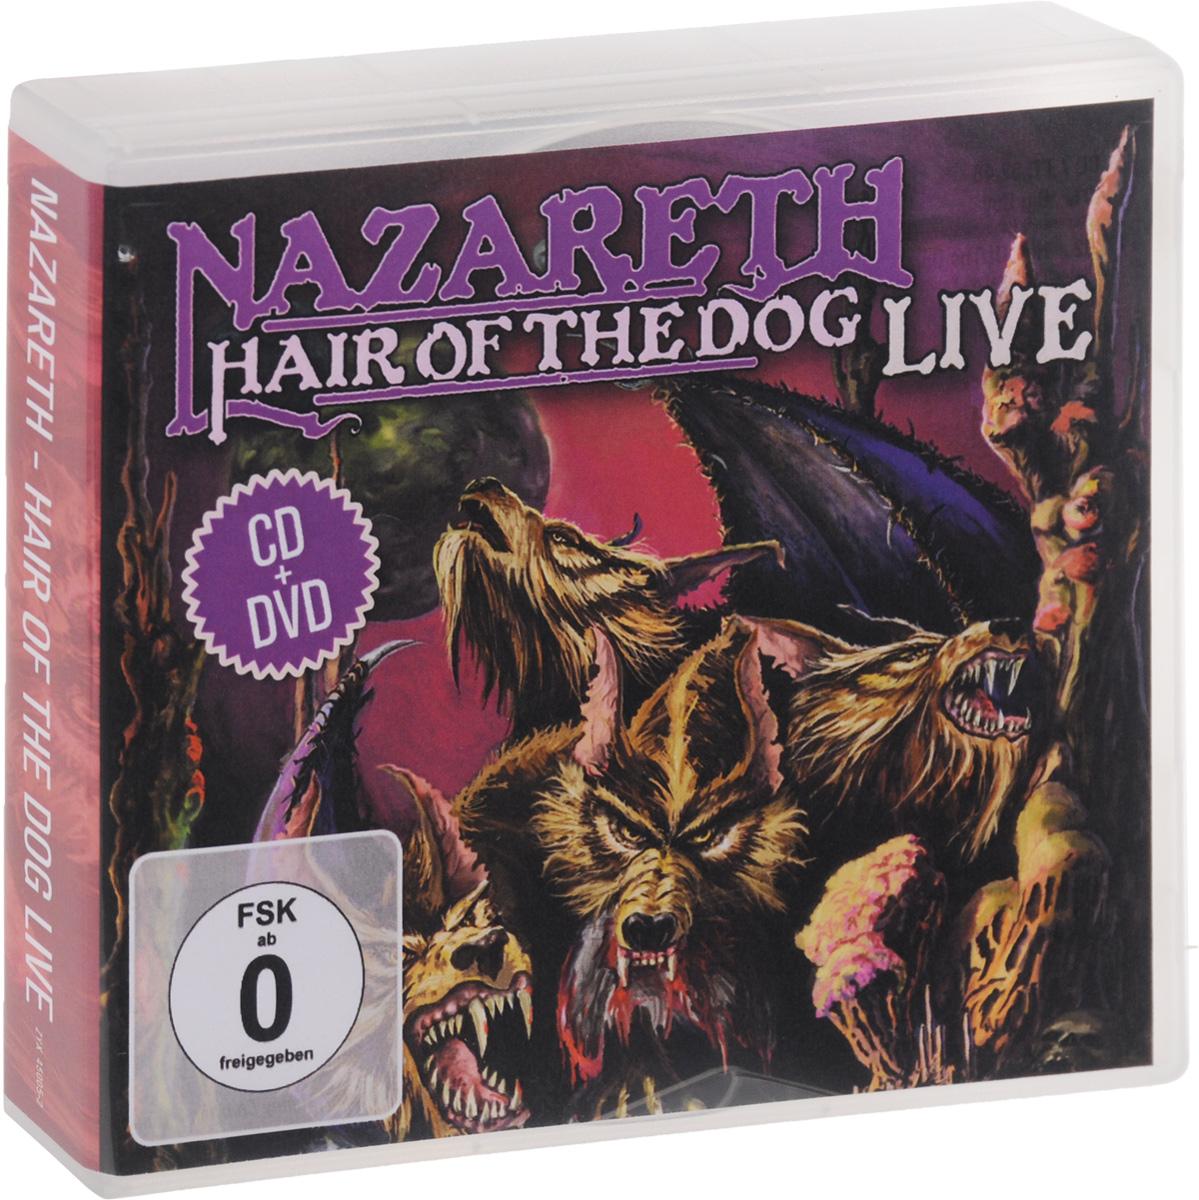 Nazareth Nazareth. Hair Of The Dog. Live (CD + DVD) produino digital 3 axis acceleration of gravity tilt module iic spi transmission for arduino